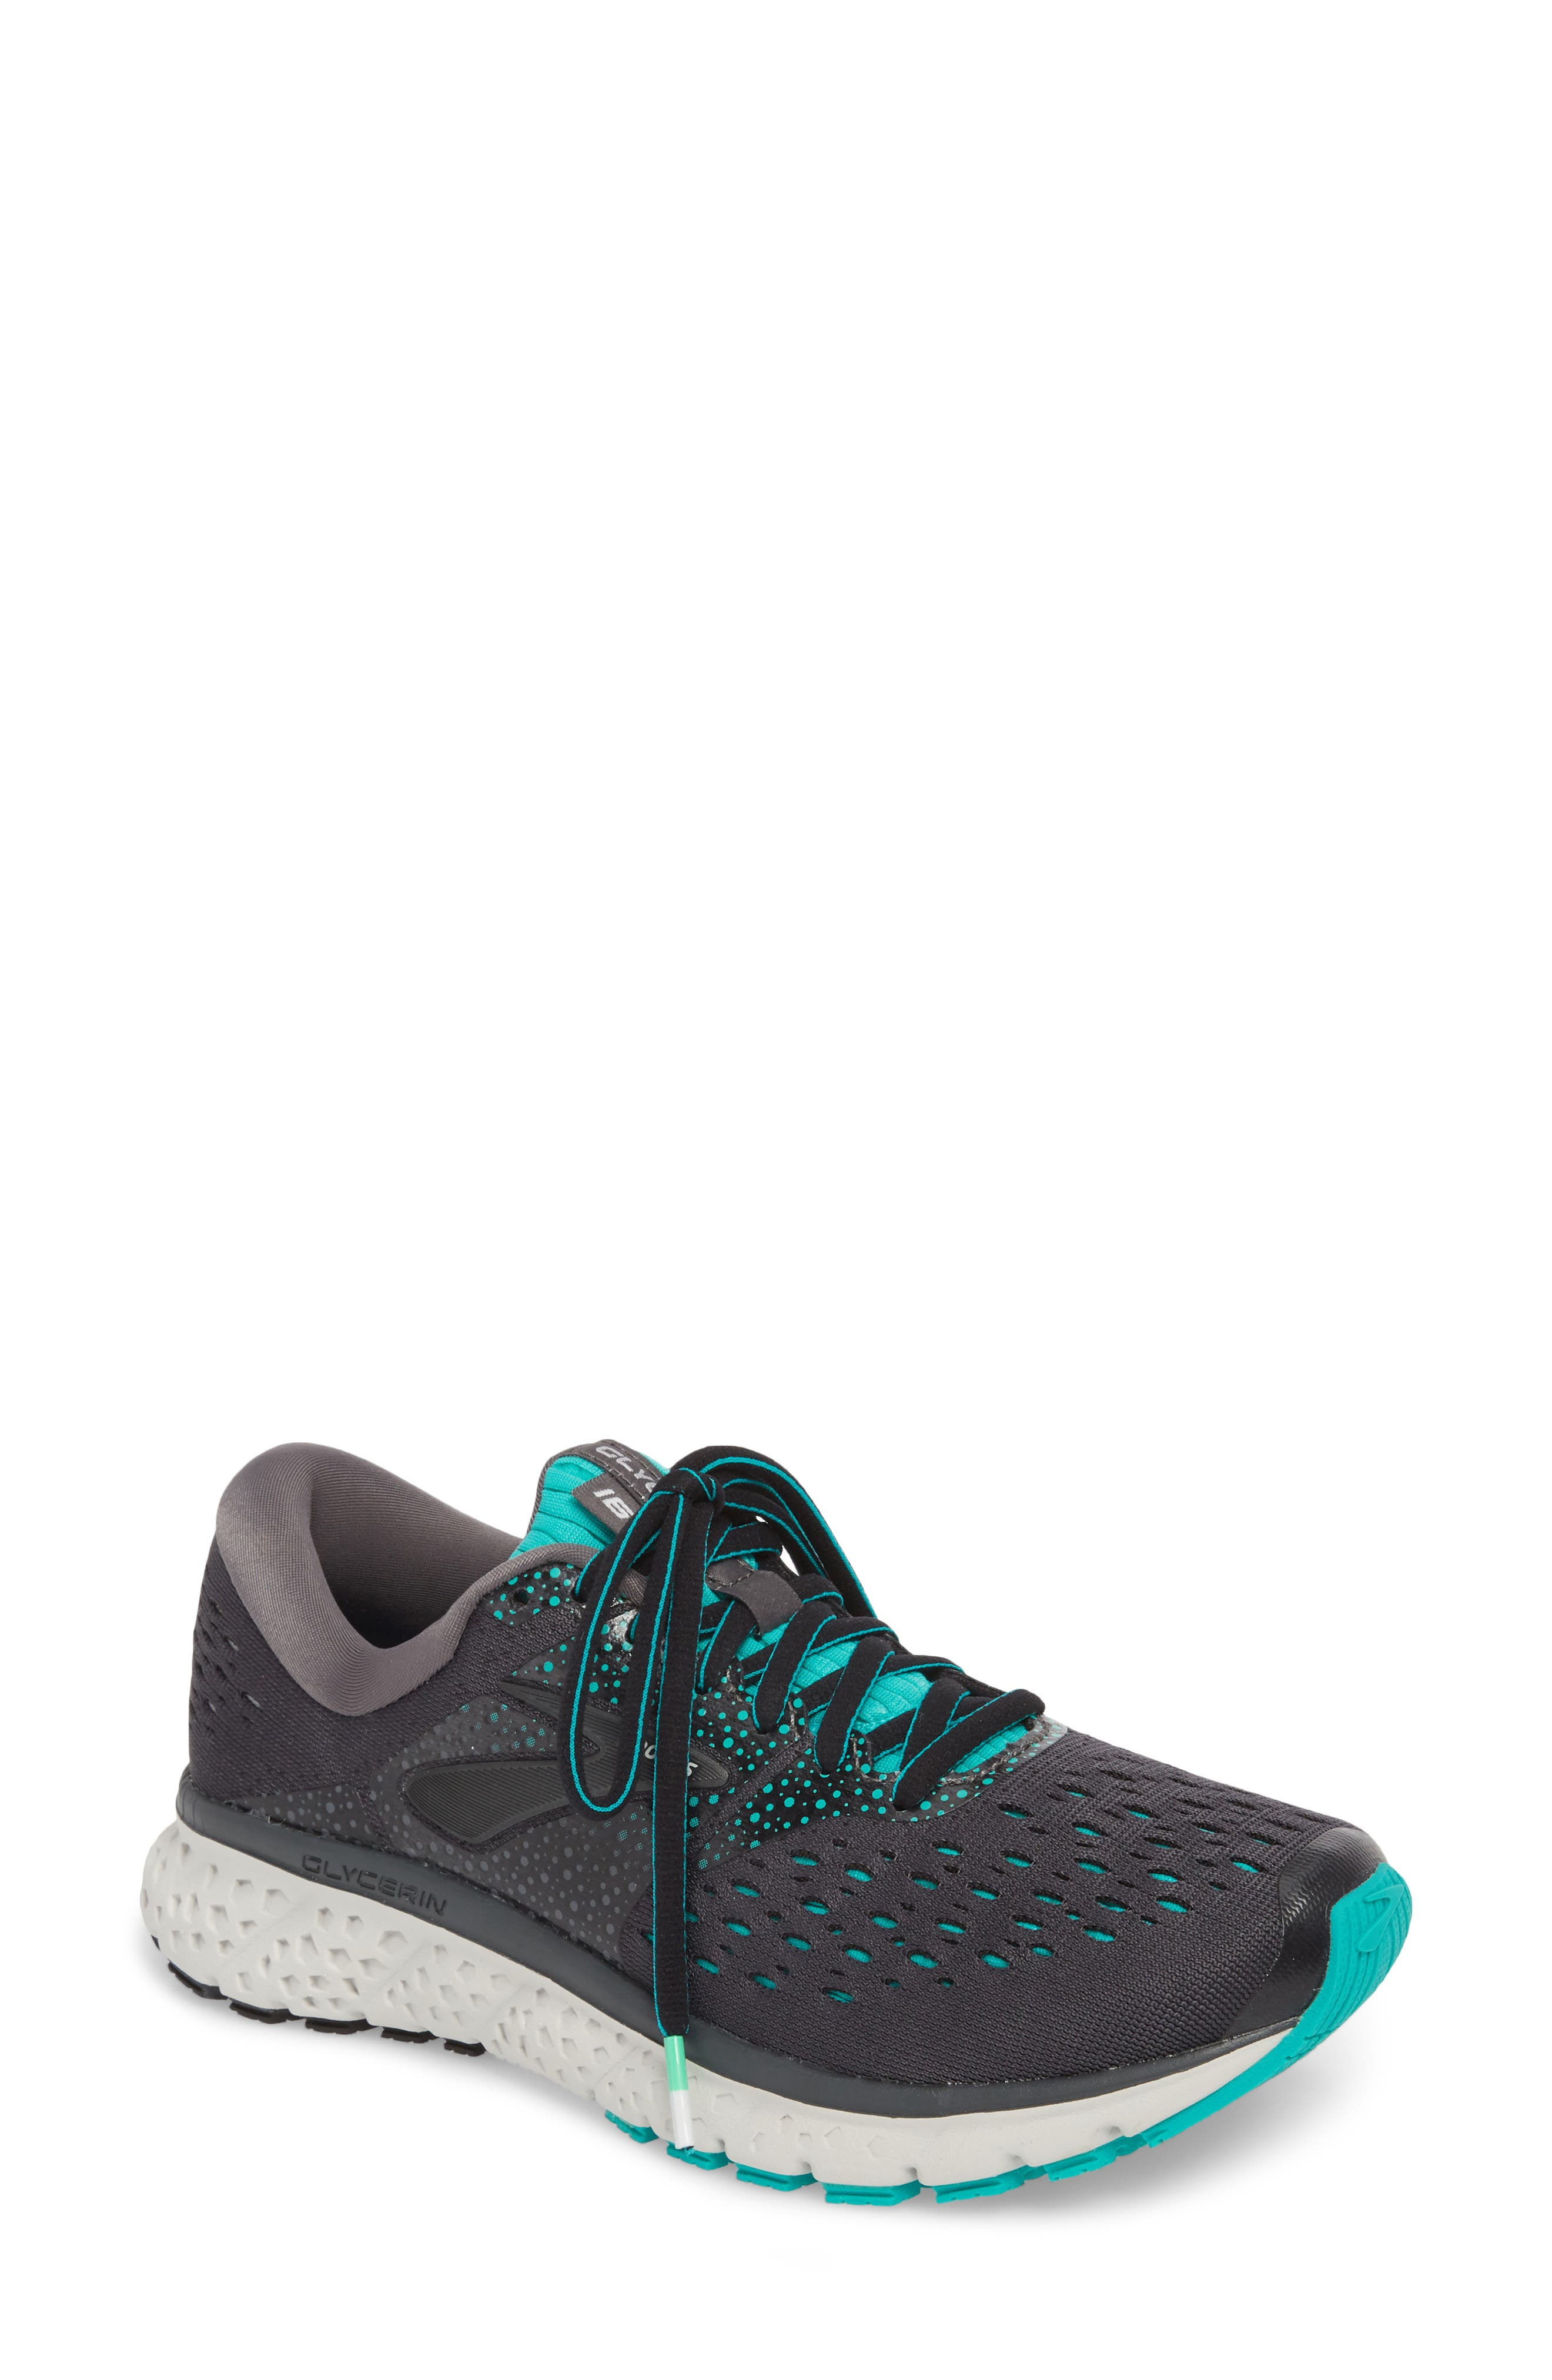 Glycerin 16 Running Shoe, Main, color, EBONY/ GREEN/ BLACK